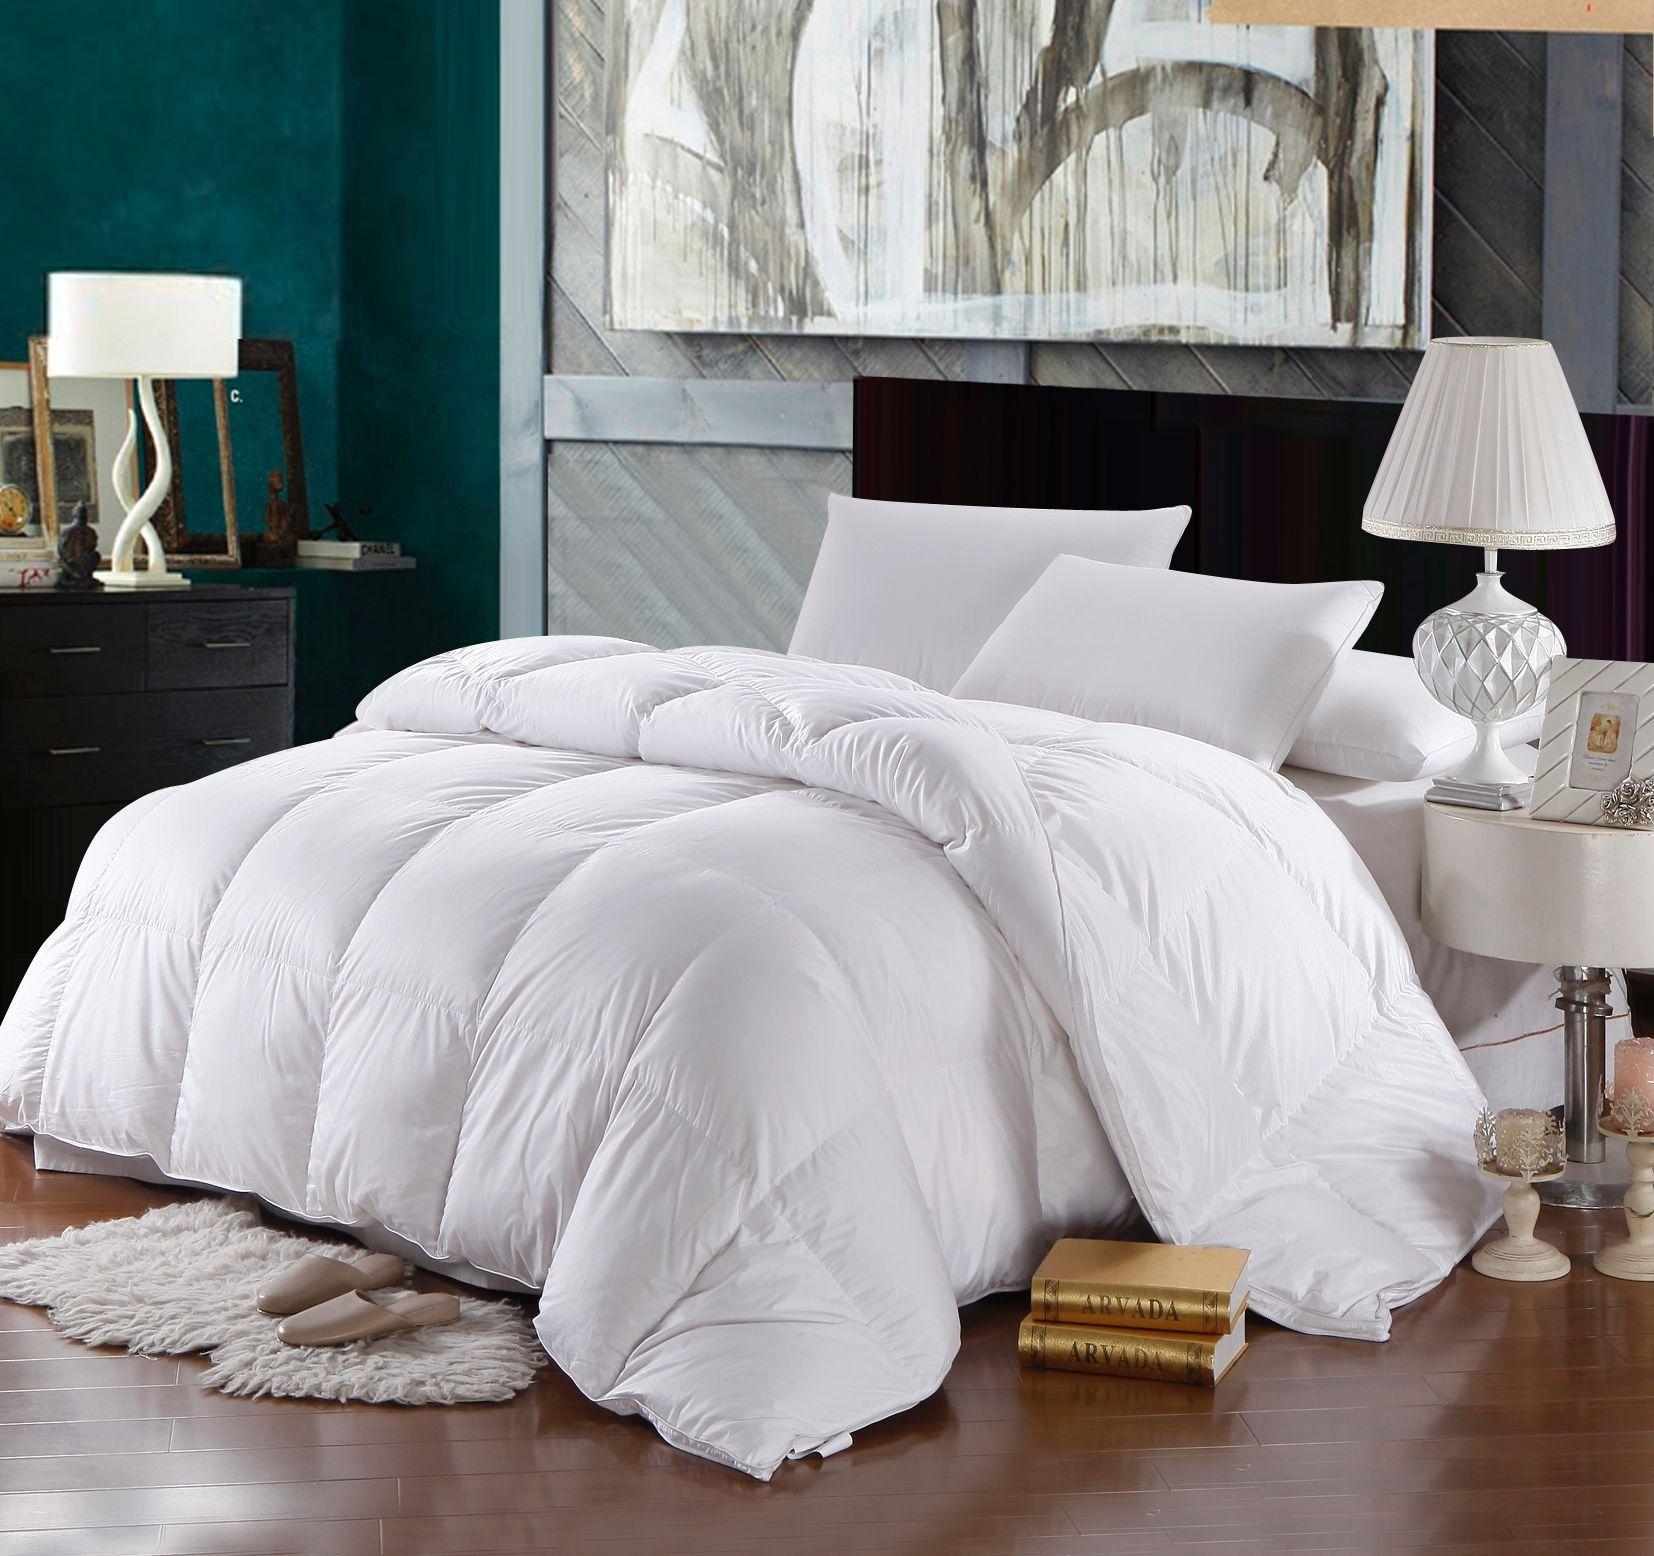 Amazon Com California King Size Down Comforter 500 Thread Count